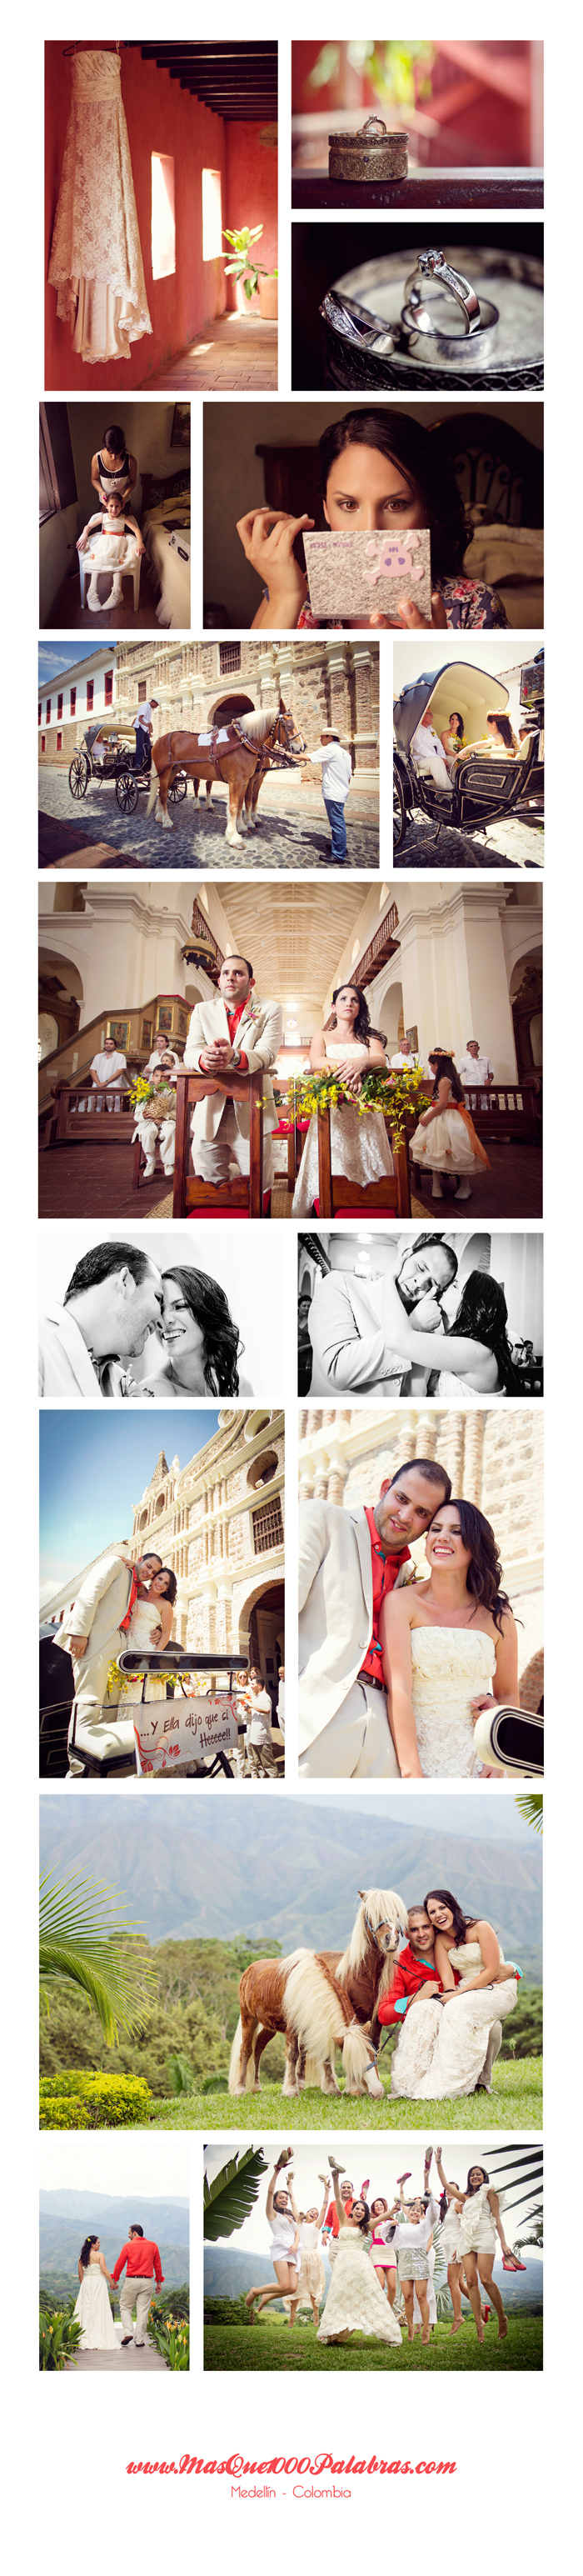 boda, santa fe de antioquia, carolina y mauricio, santa barbara, fotografias